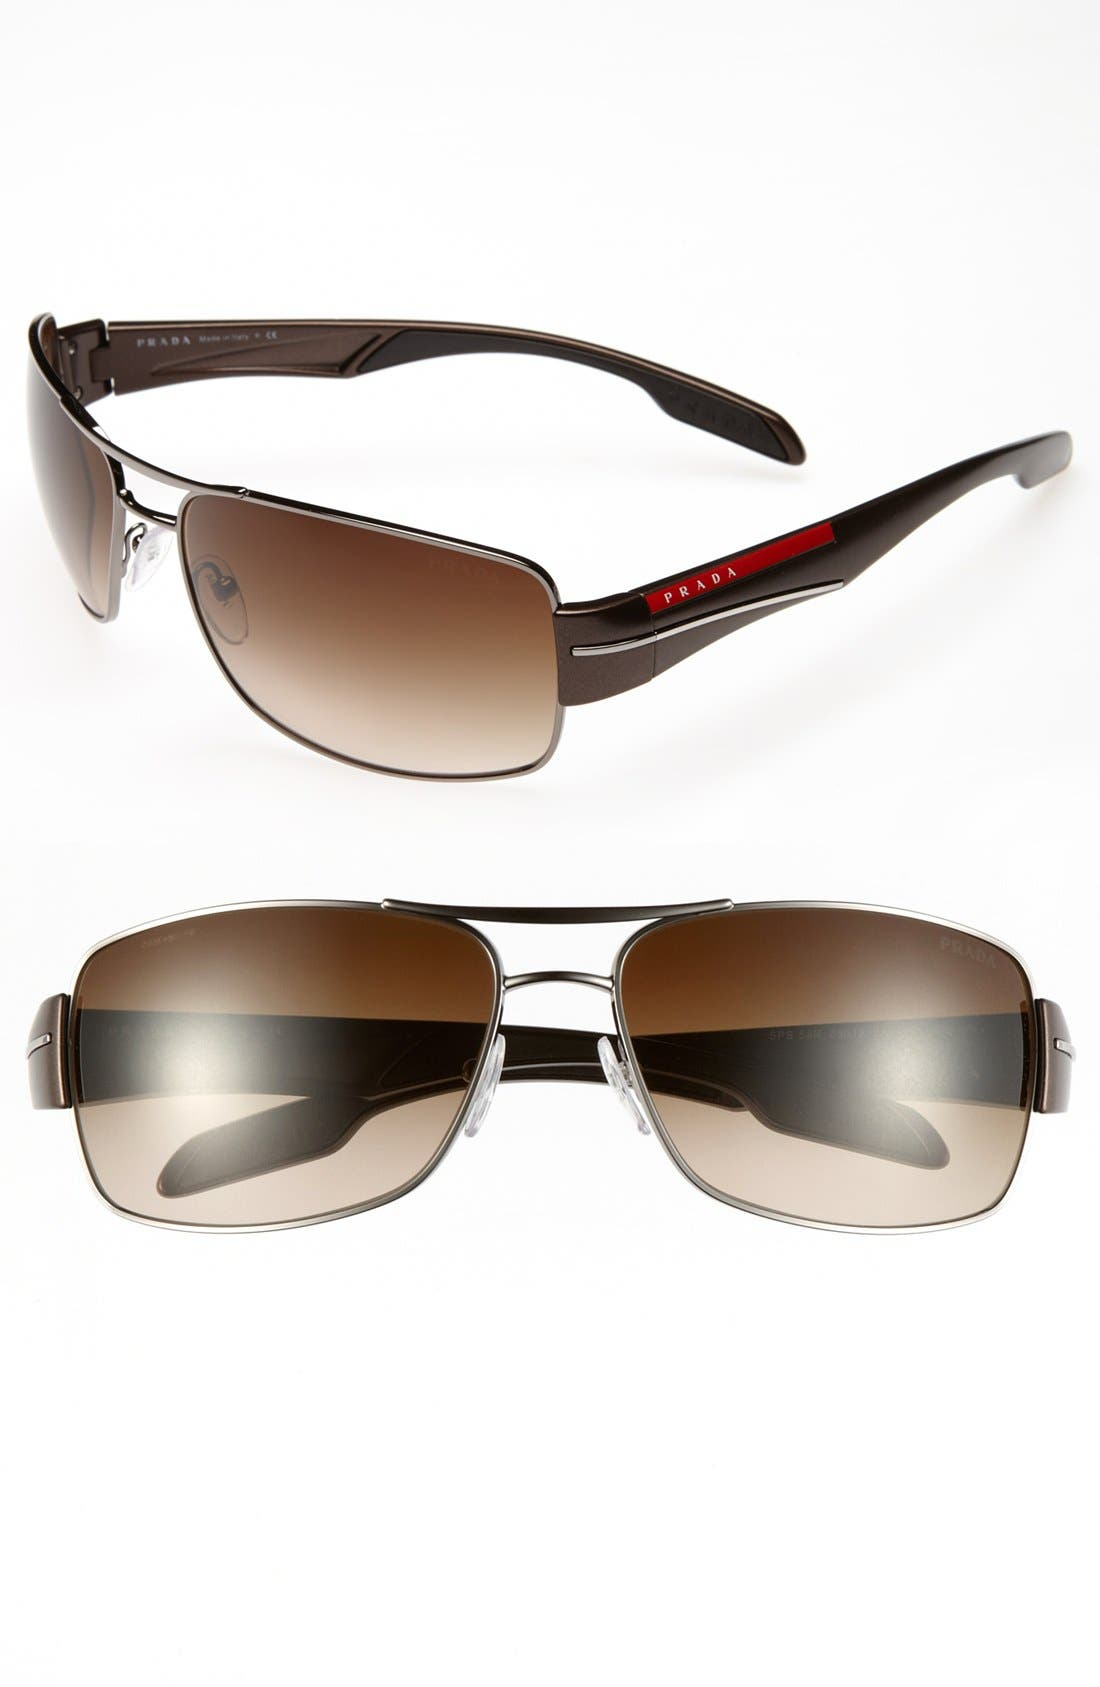 Main Image - Prada 65mm Aviator Sunglasses